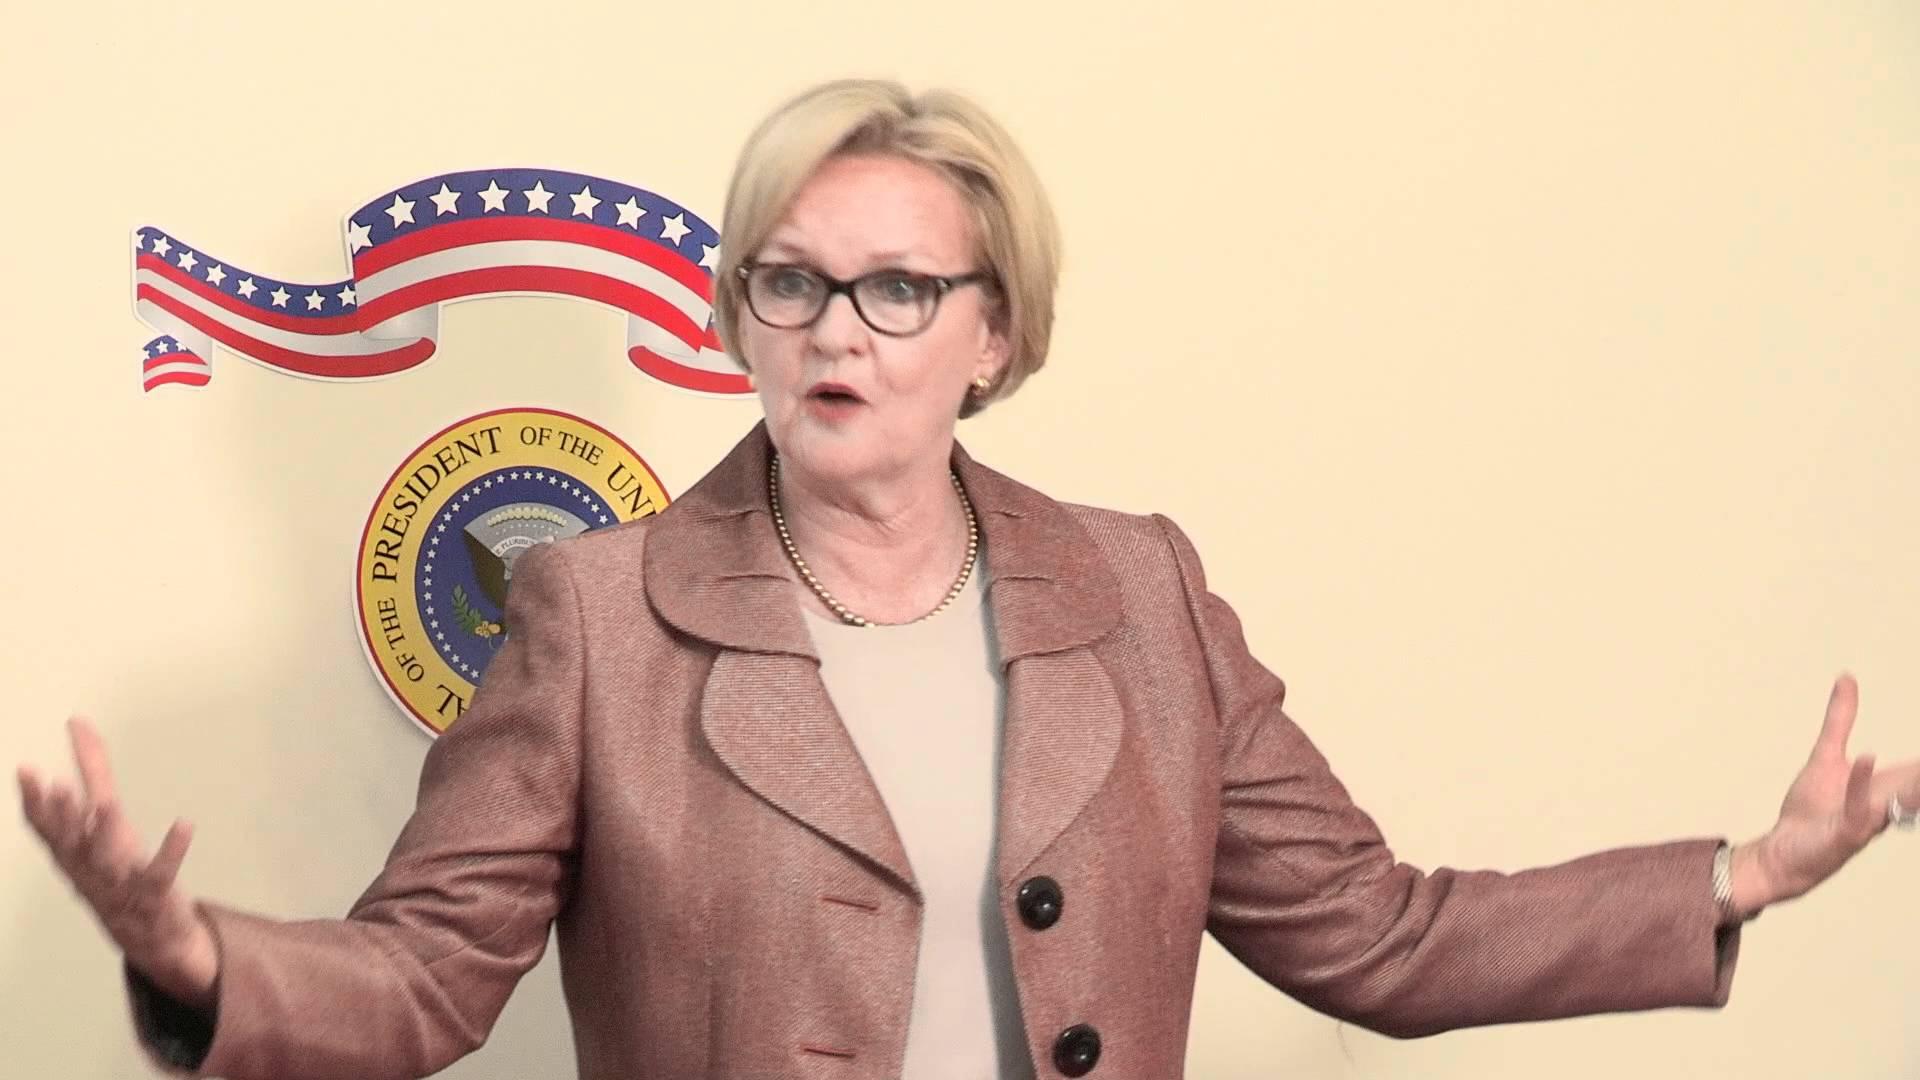 Senator McCaskill tours Missouri with town hall series